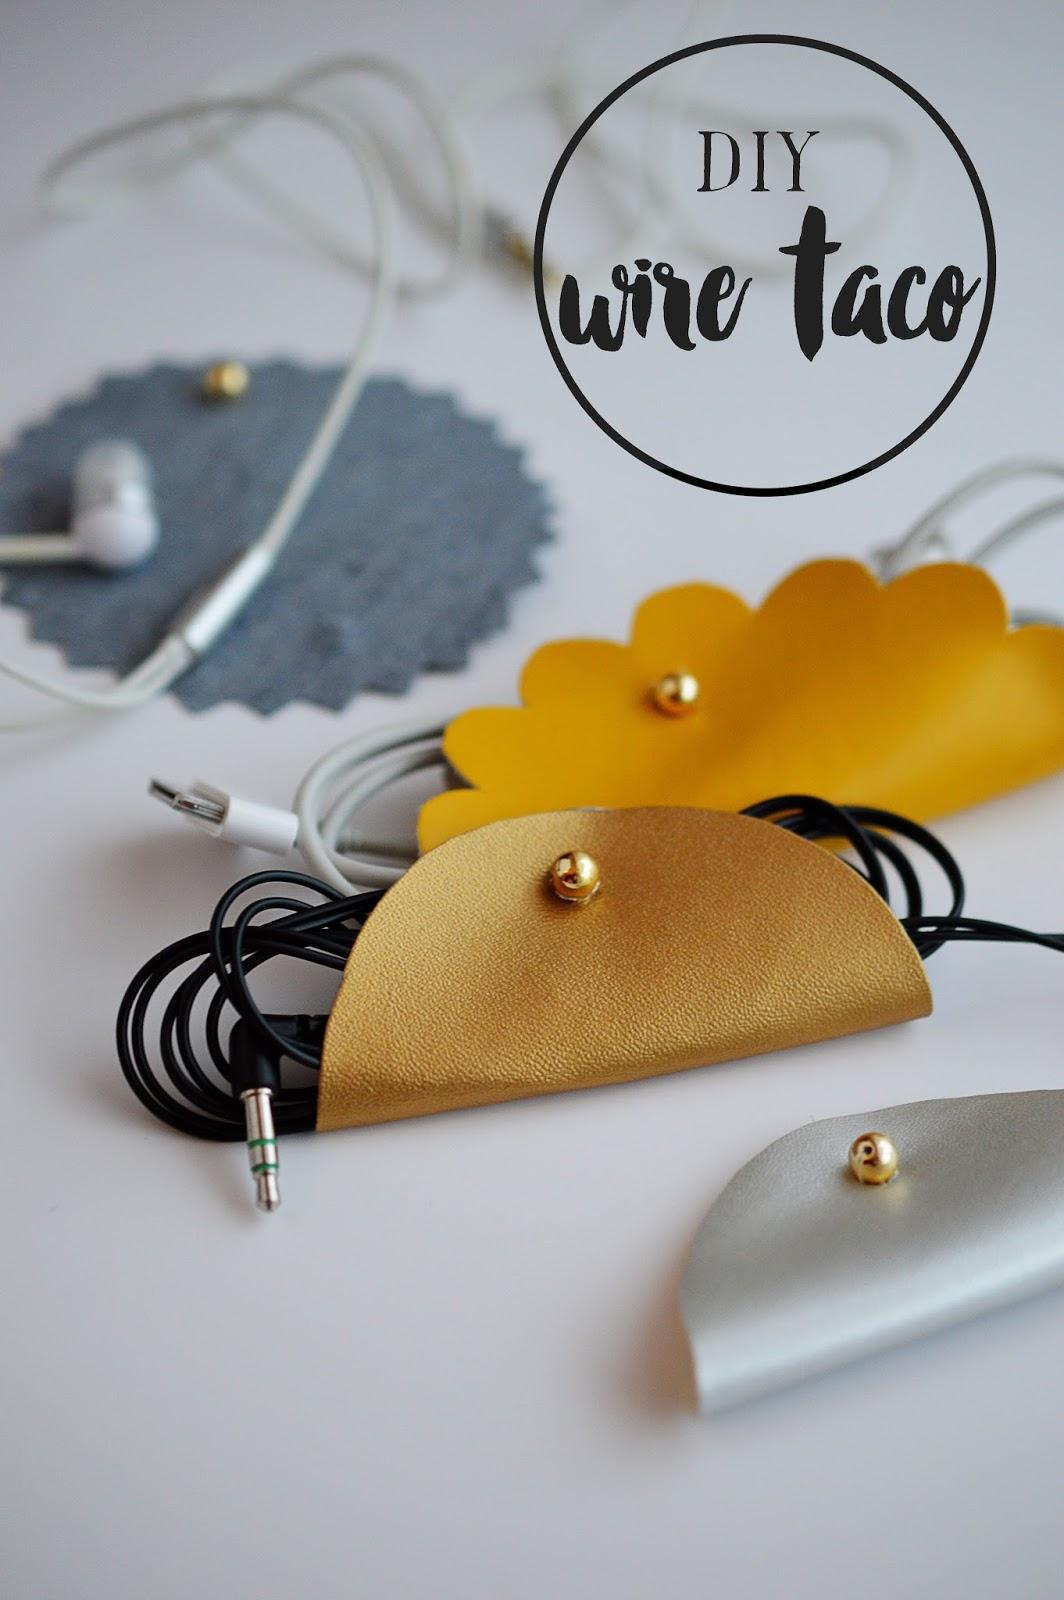 DIY Wire Tacos | Motte's Blog